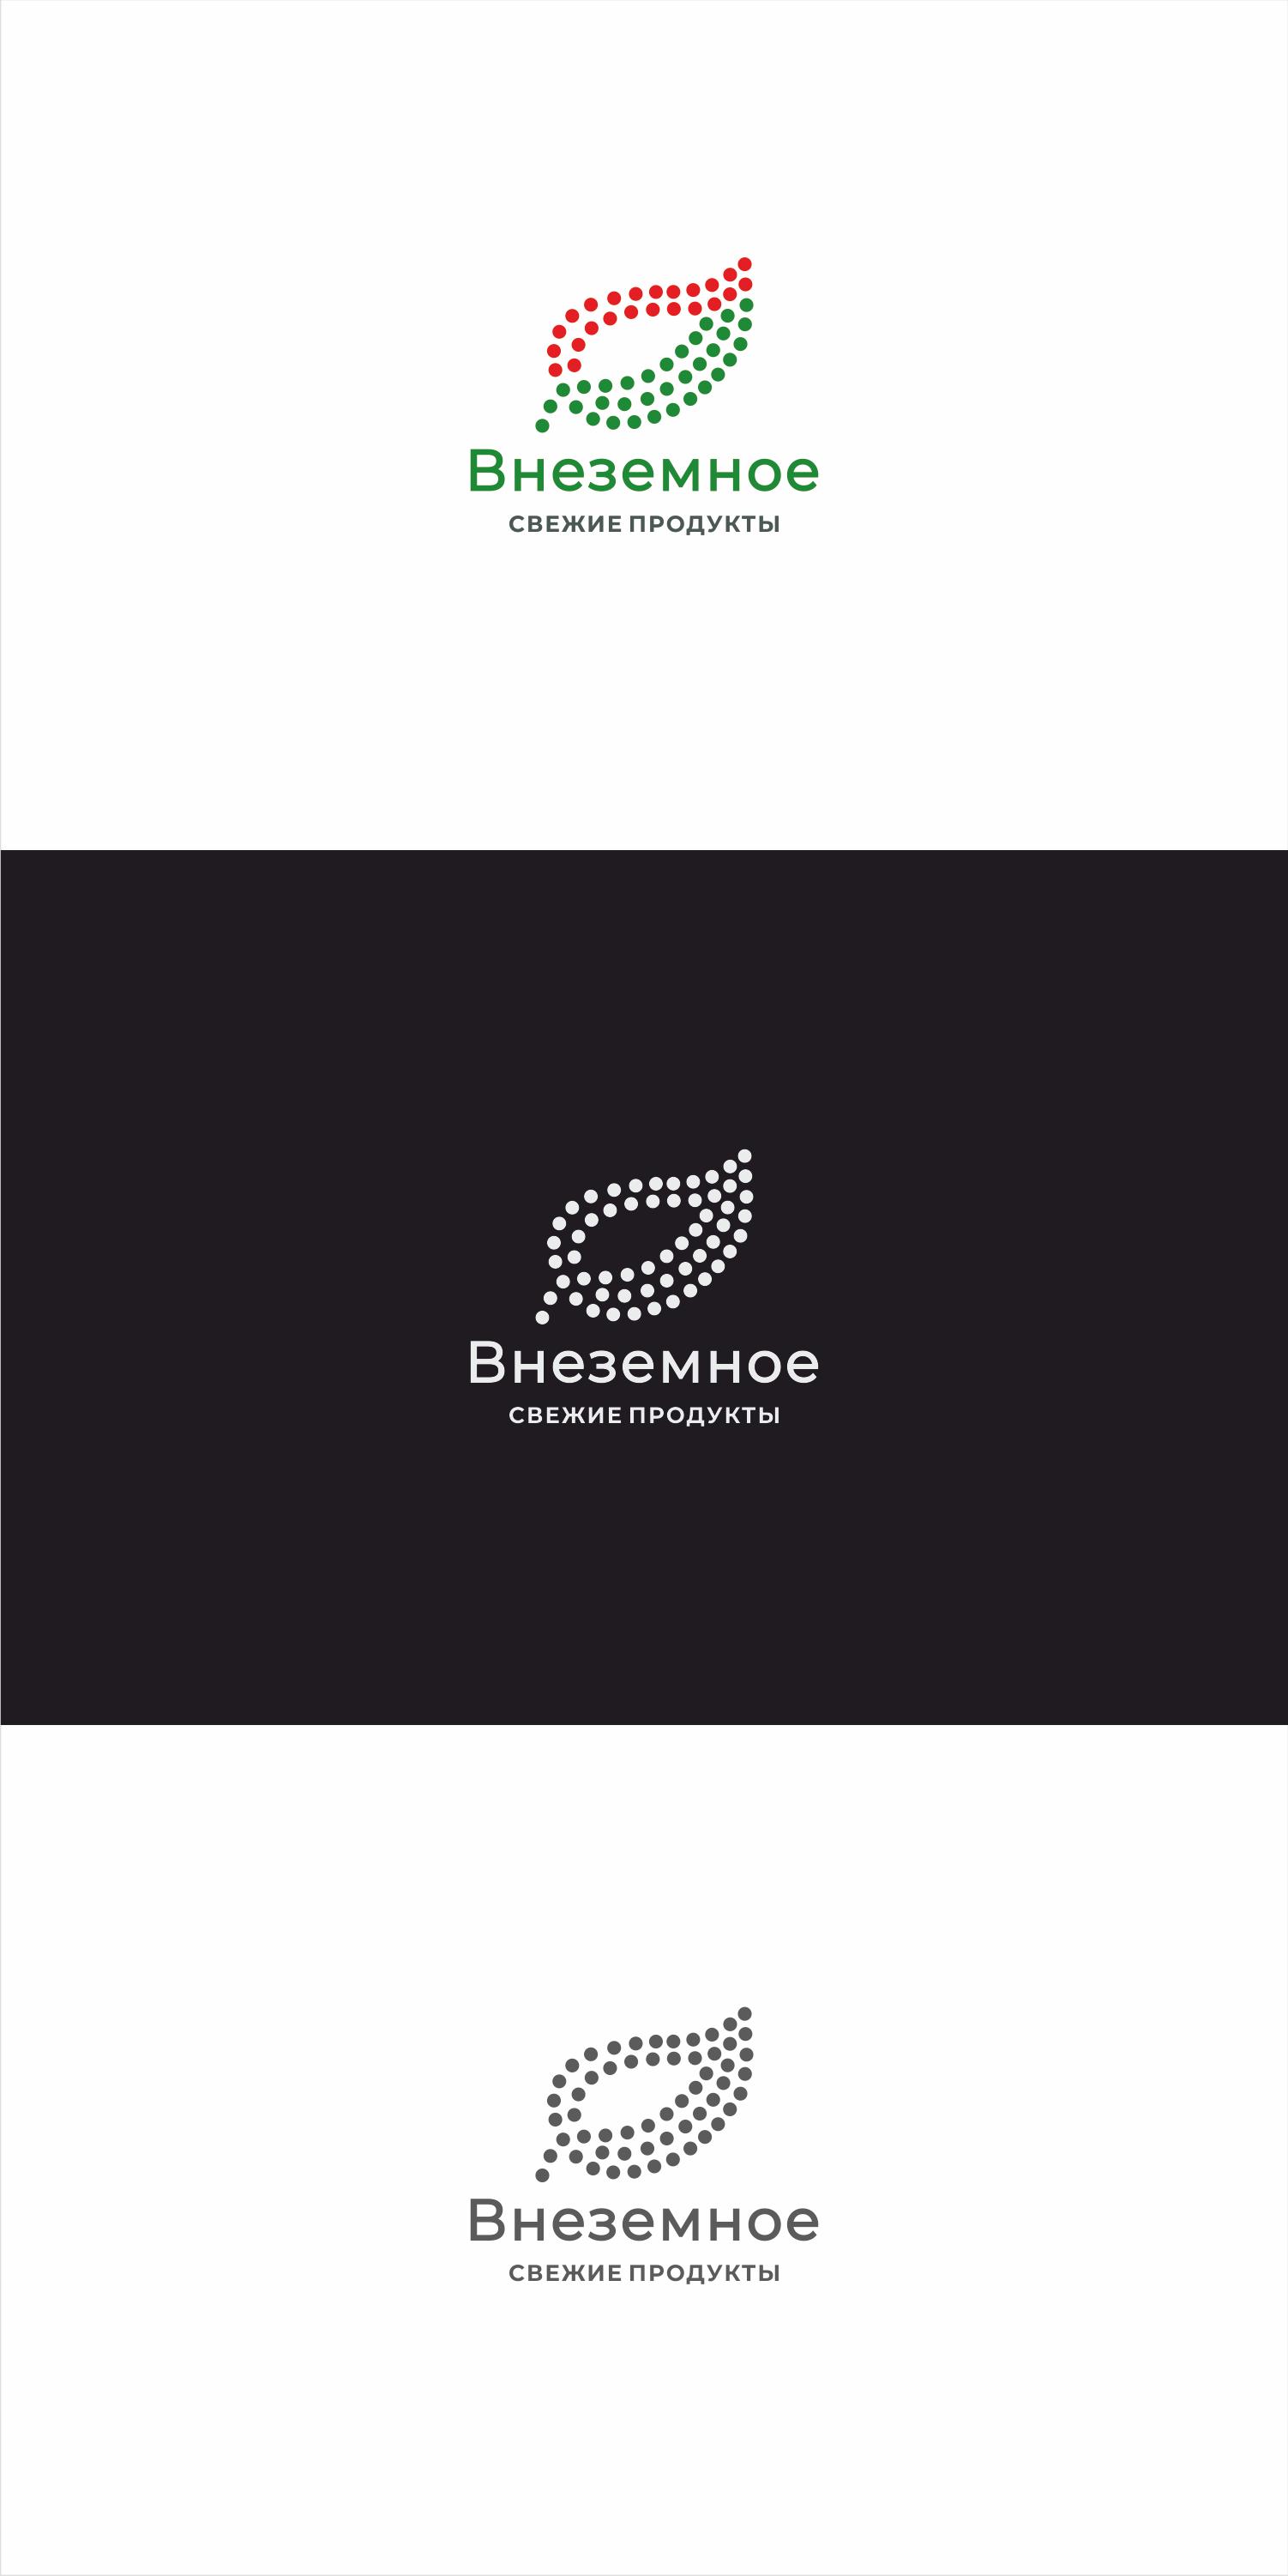 "Логотип и фирменный стиль ""Внеземное"" фото f_0405e7a211c67171.png"